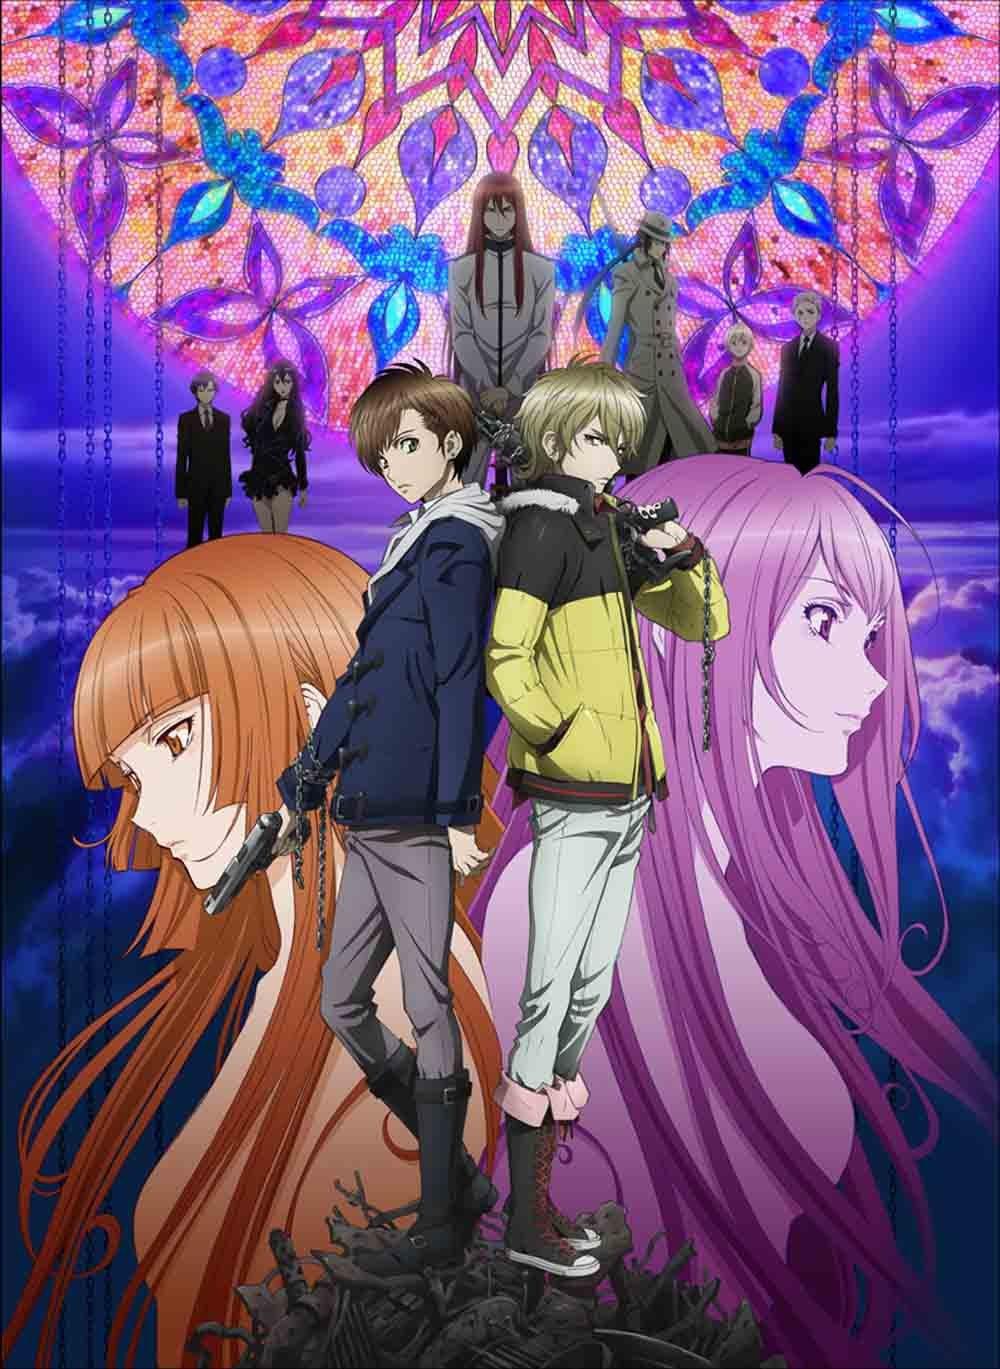 5 Rekomendasi Anime yang Jalan Ceritanya Bikin Pusing 4